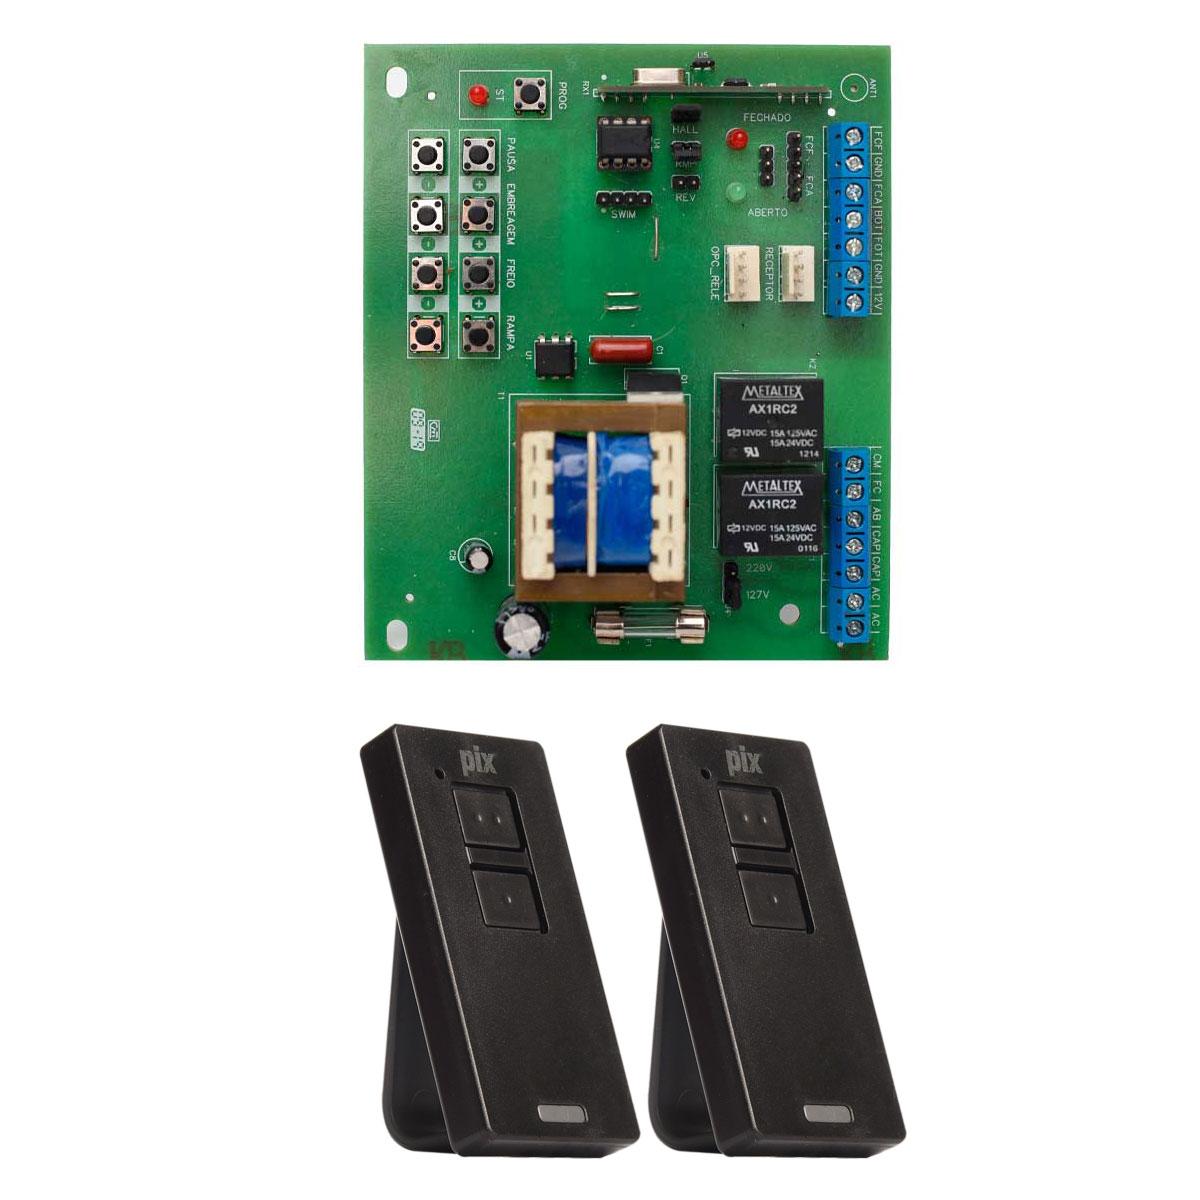 Kit Placa X4 Central Rossi DZ3 DZ4 Nano Sensor Hall com 2 Controles Pix